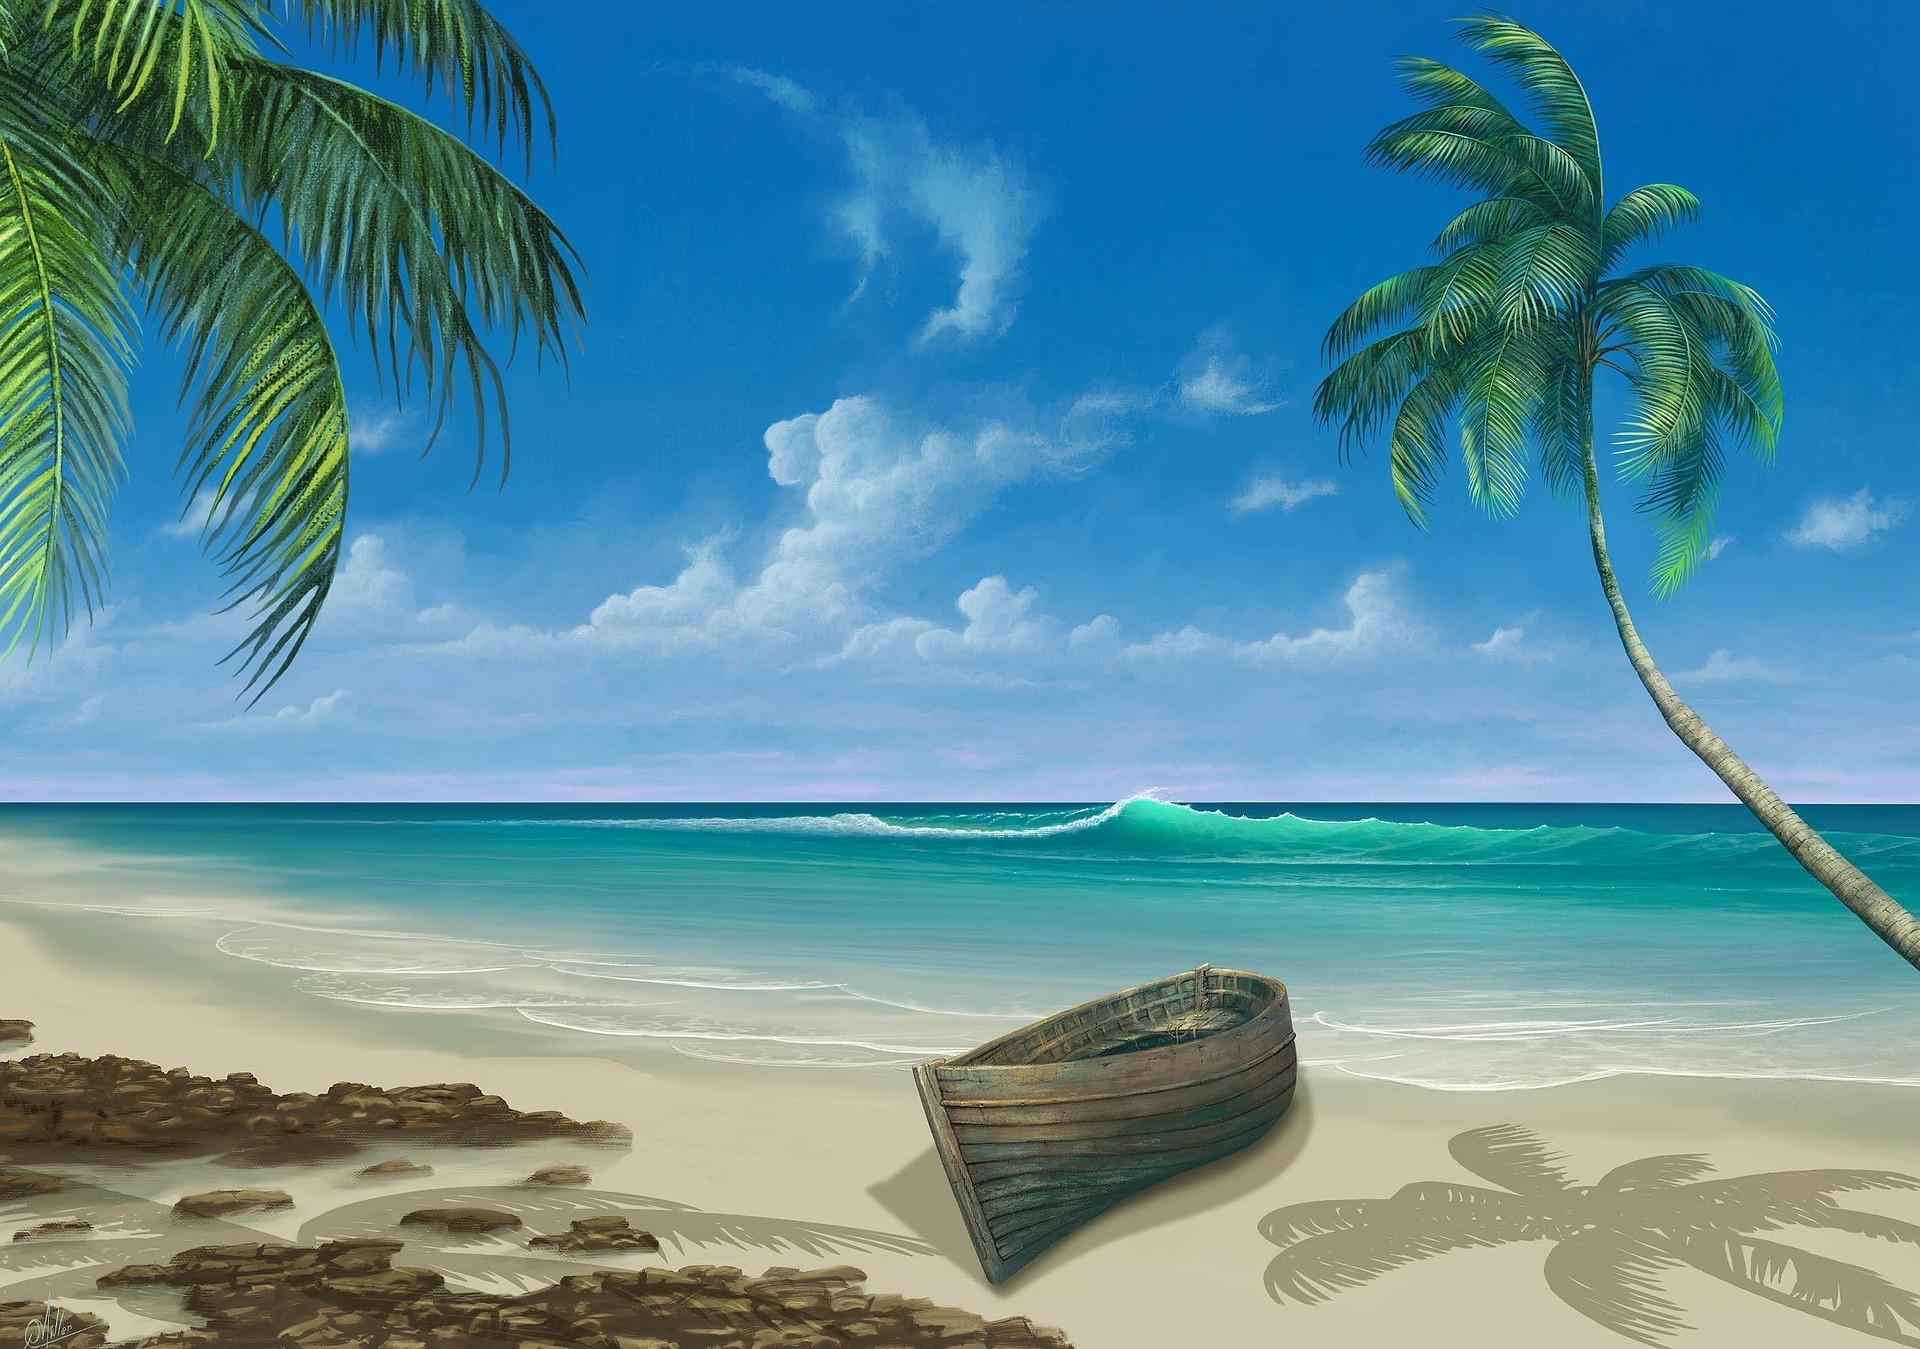 paradise 1110498 1920